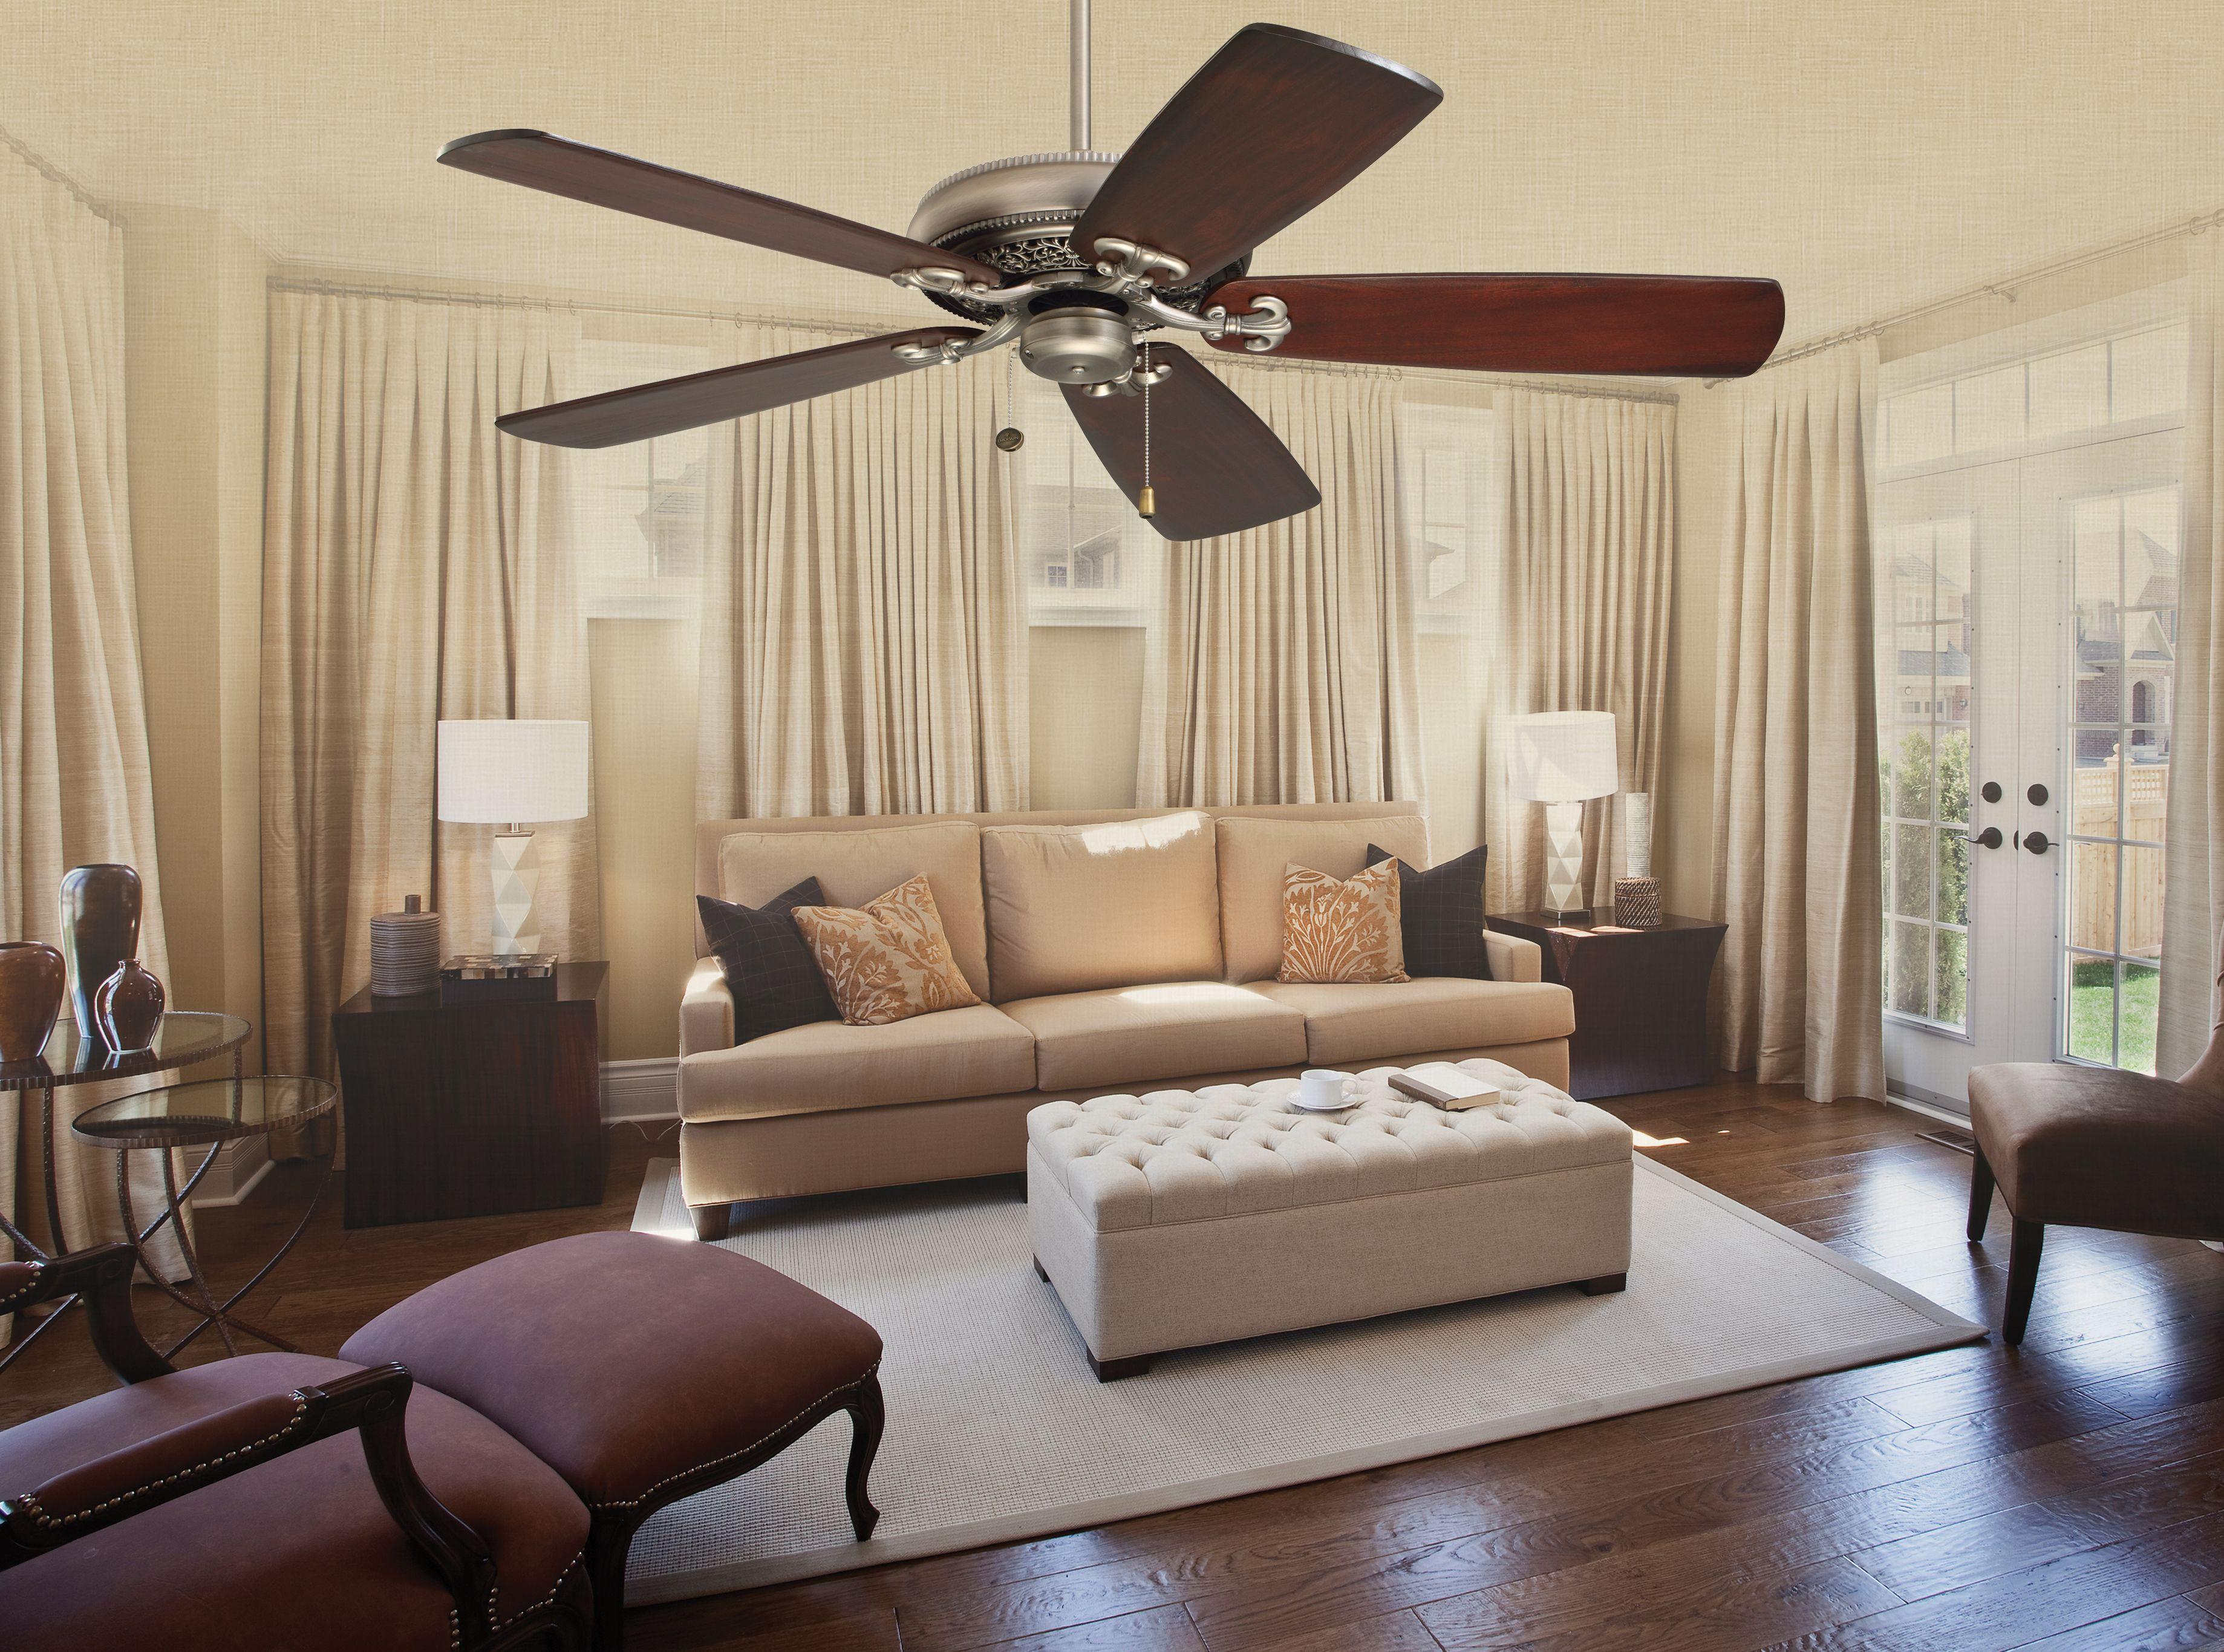 Emerson Crown Select ceiling fan